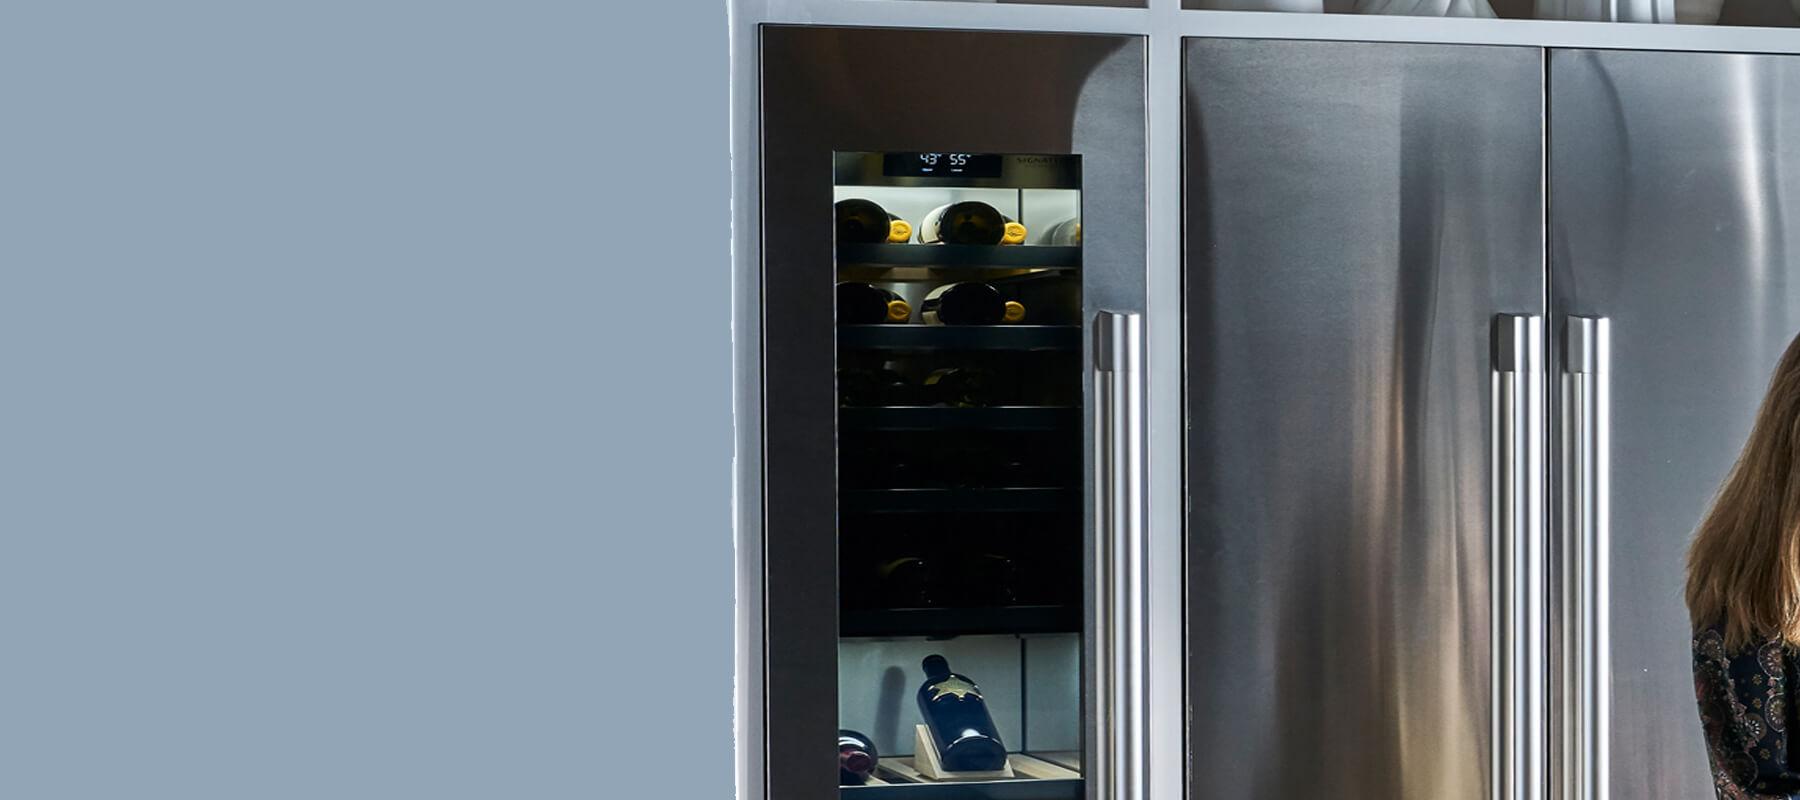 Built in Wine Refrigerator Undercounter Burbank | Built-in Refrigerator Repair